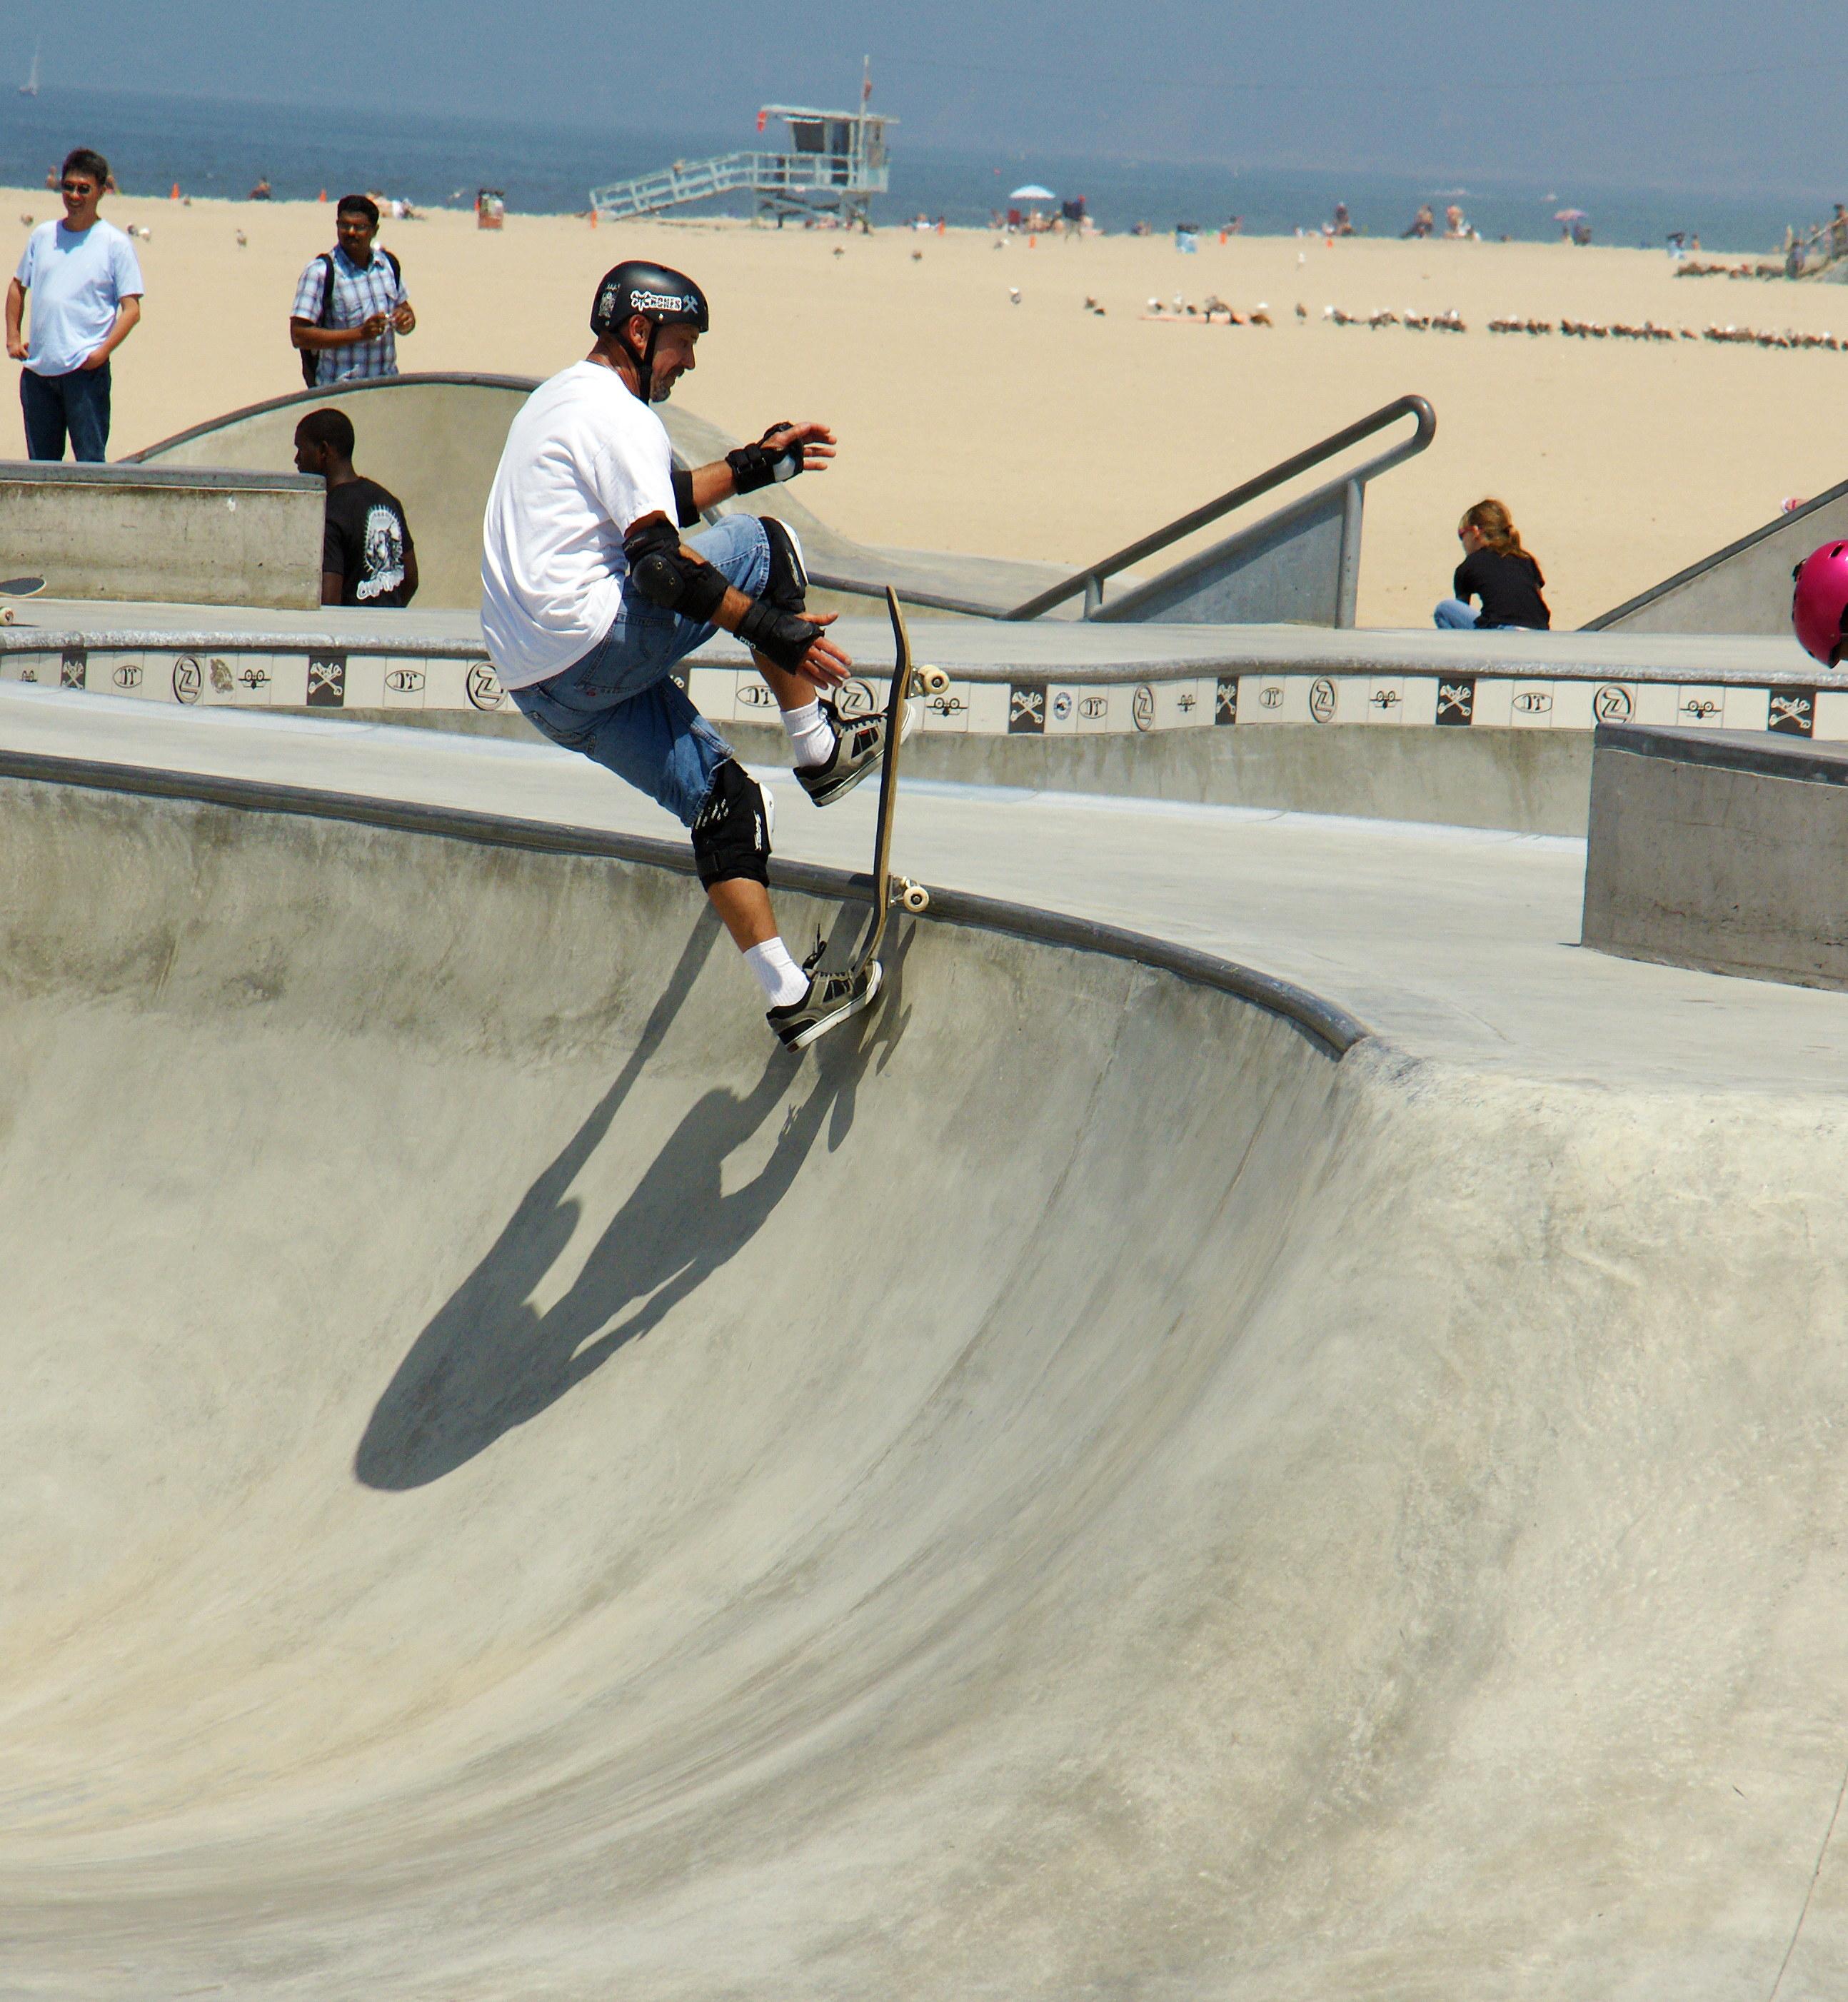 Venice Beach Skateboarder